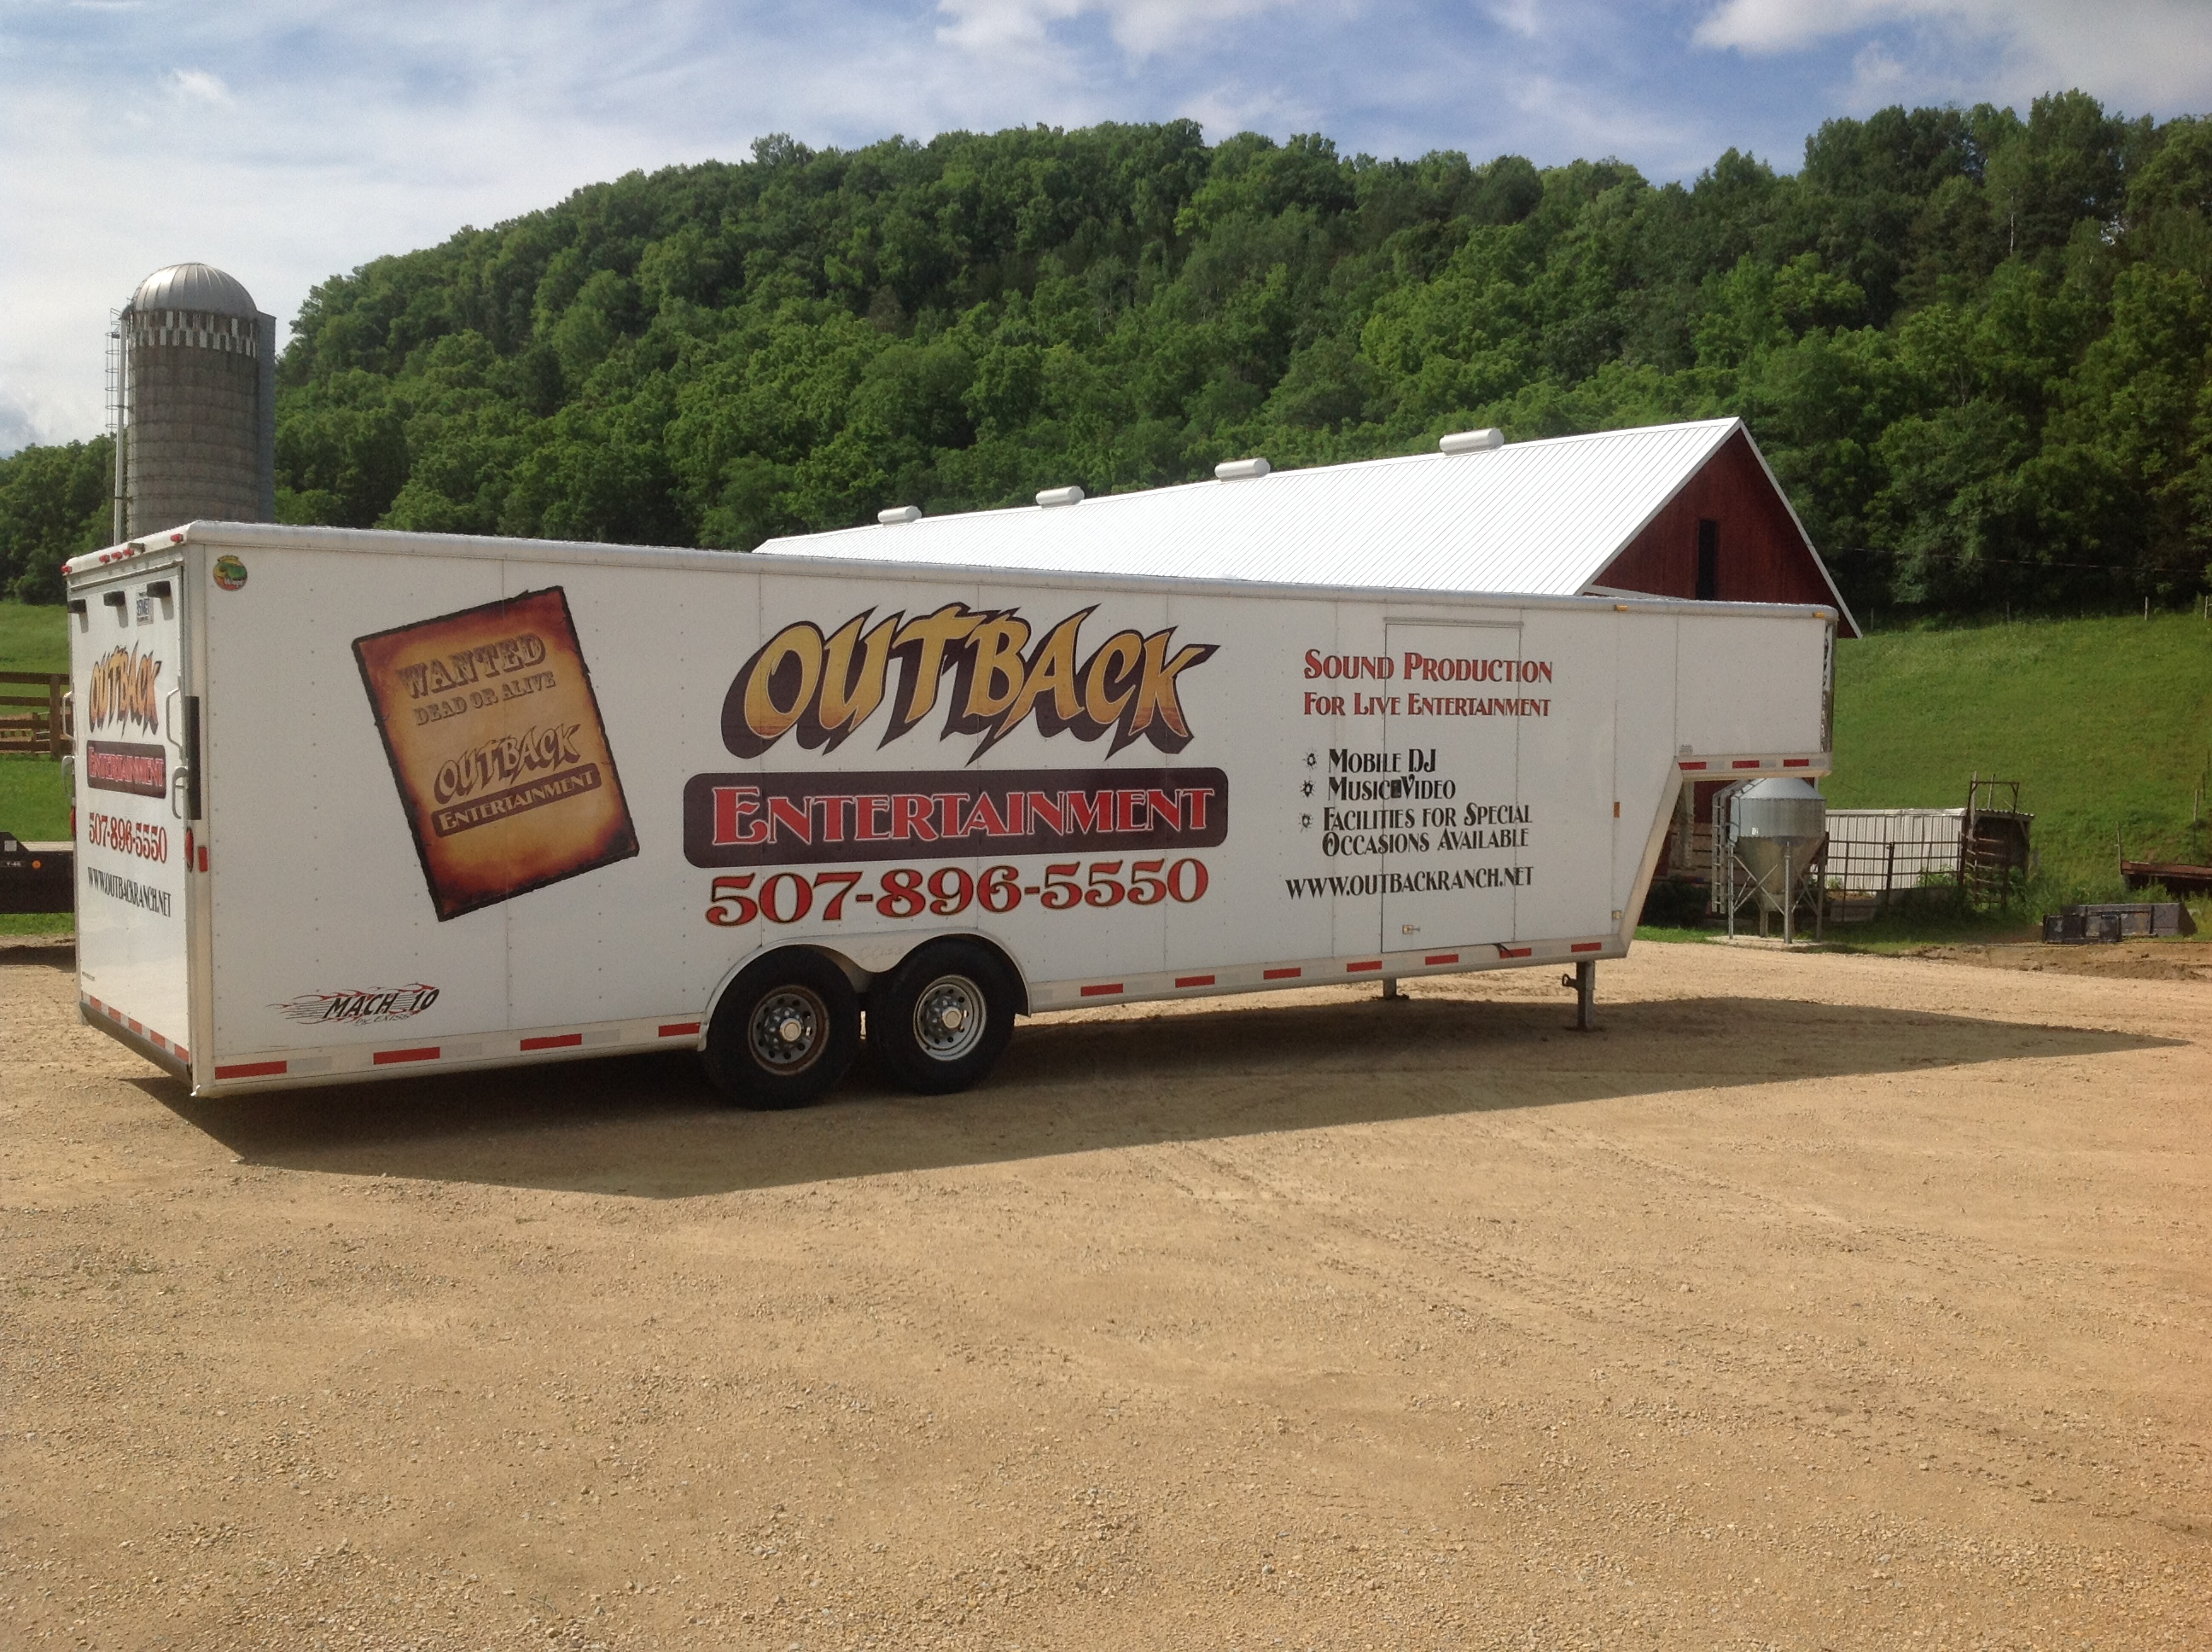 used car carrier hauler trailers for sale in mn. Black Bedroom Furniture Sets. Home Design Ideas